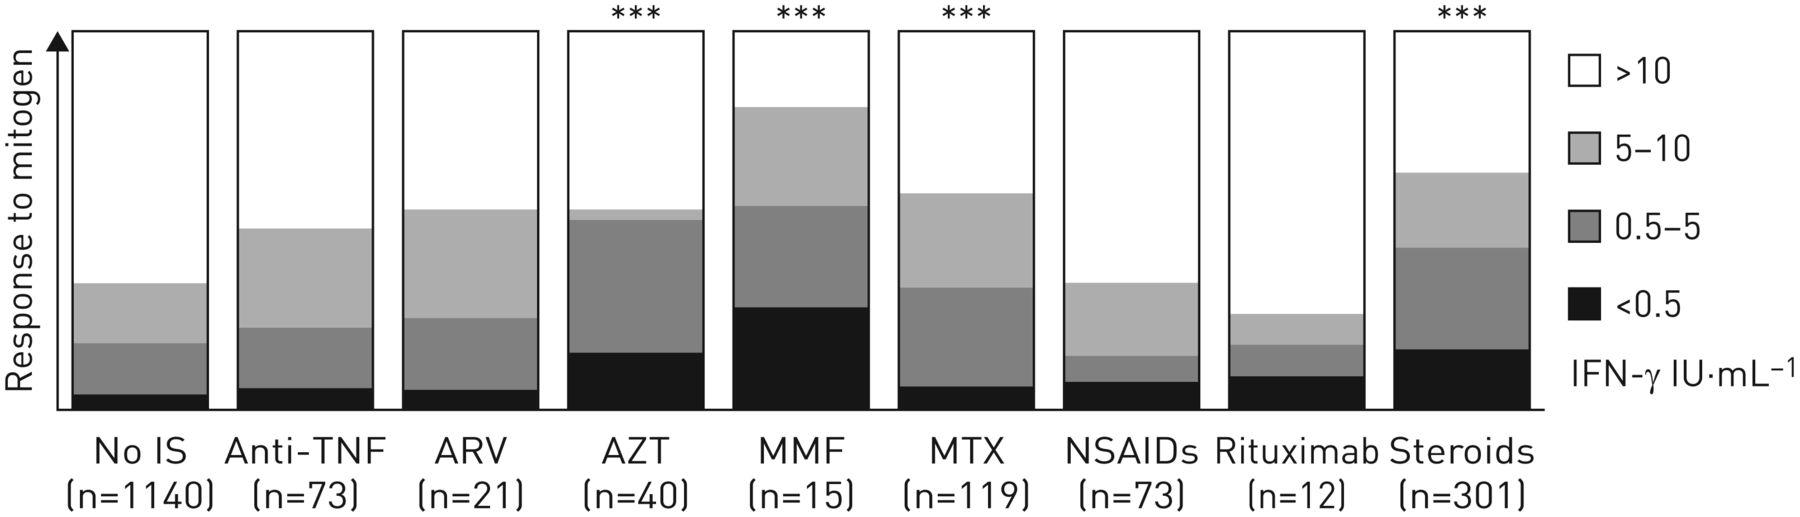 QuantiFERON test interpretation in patients receiving